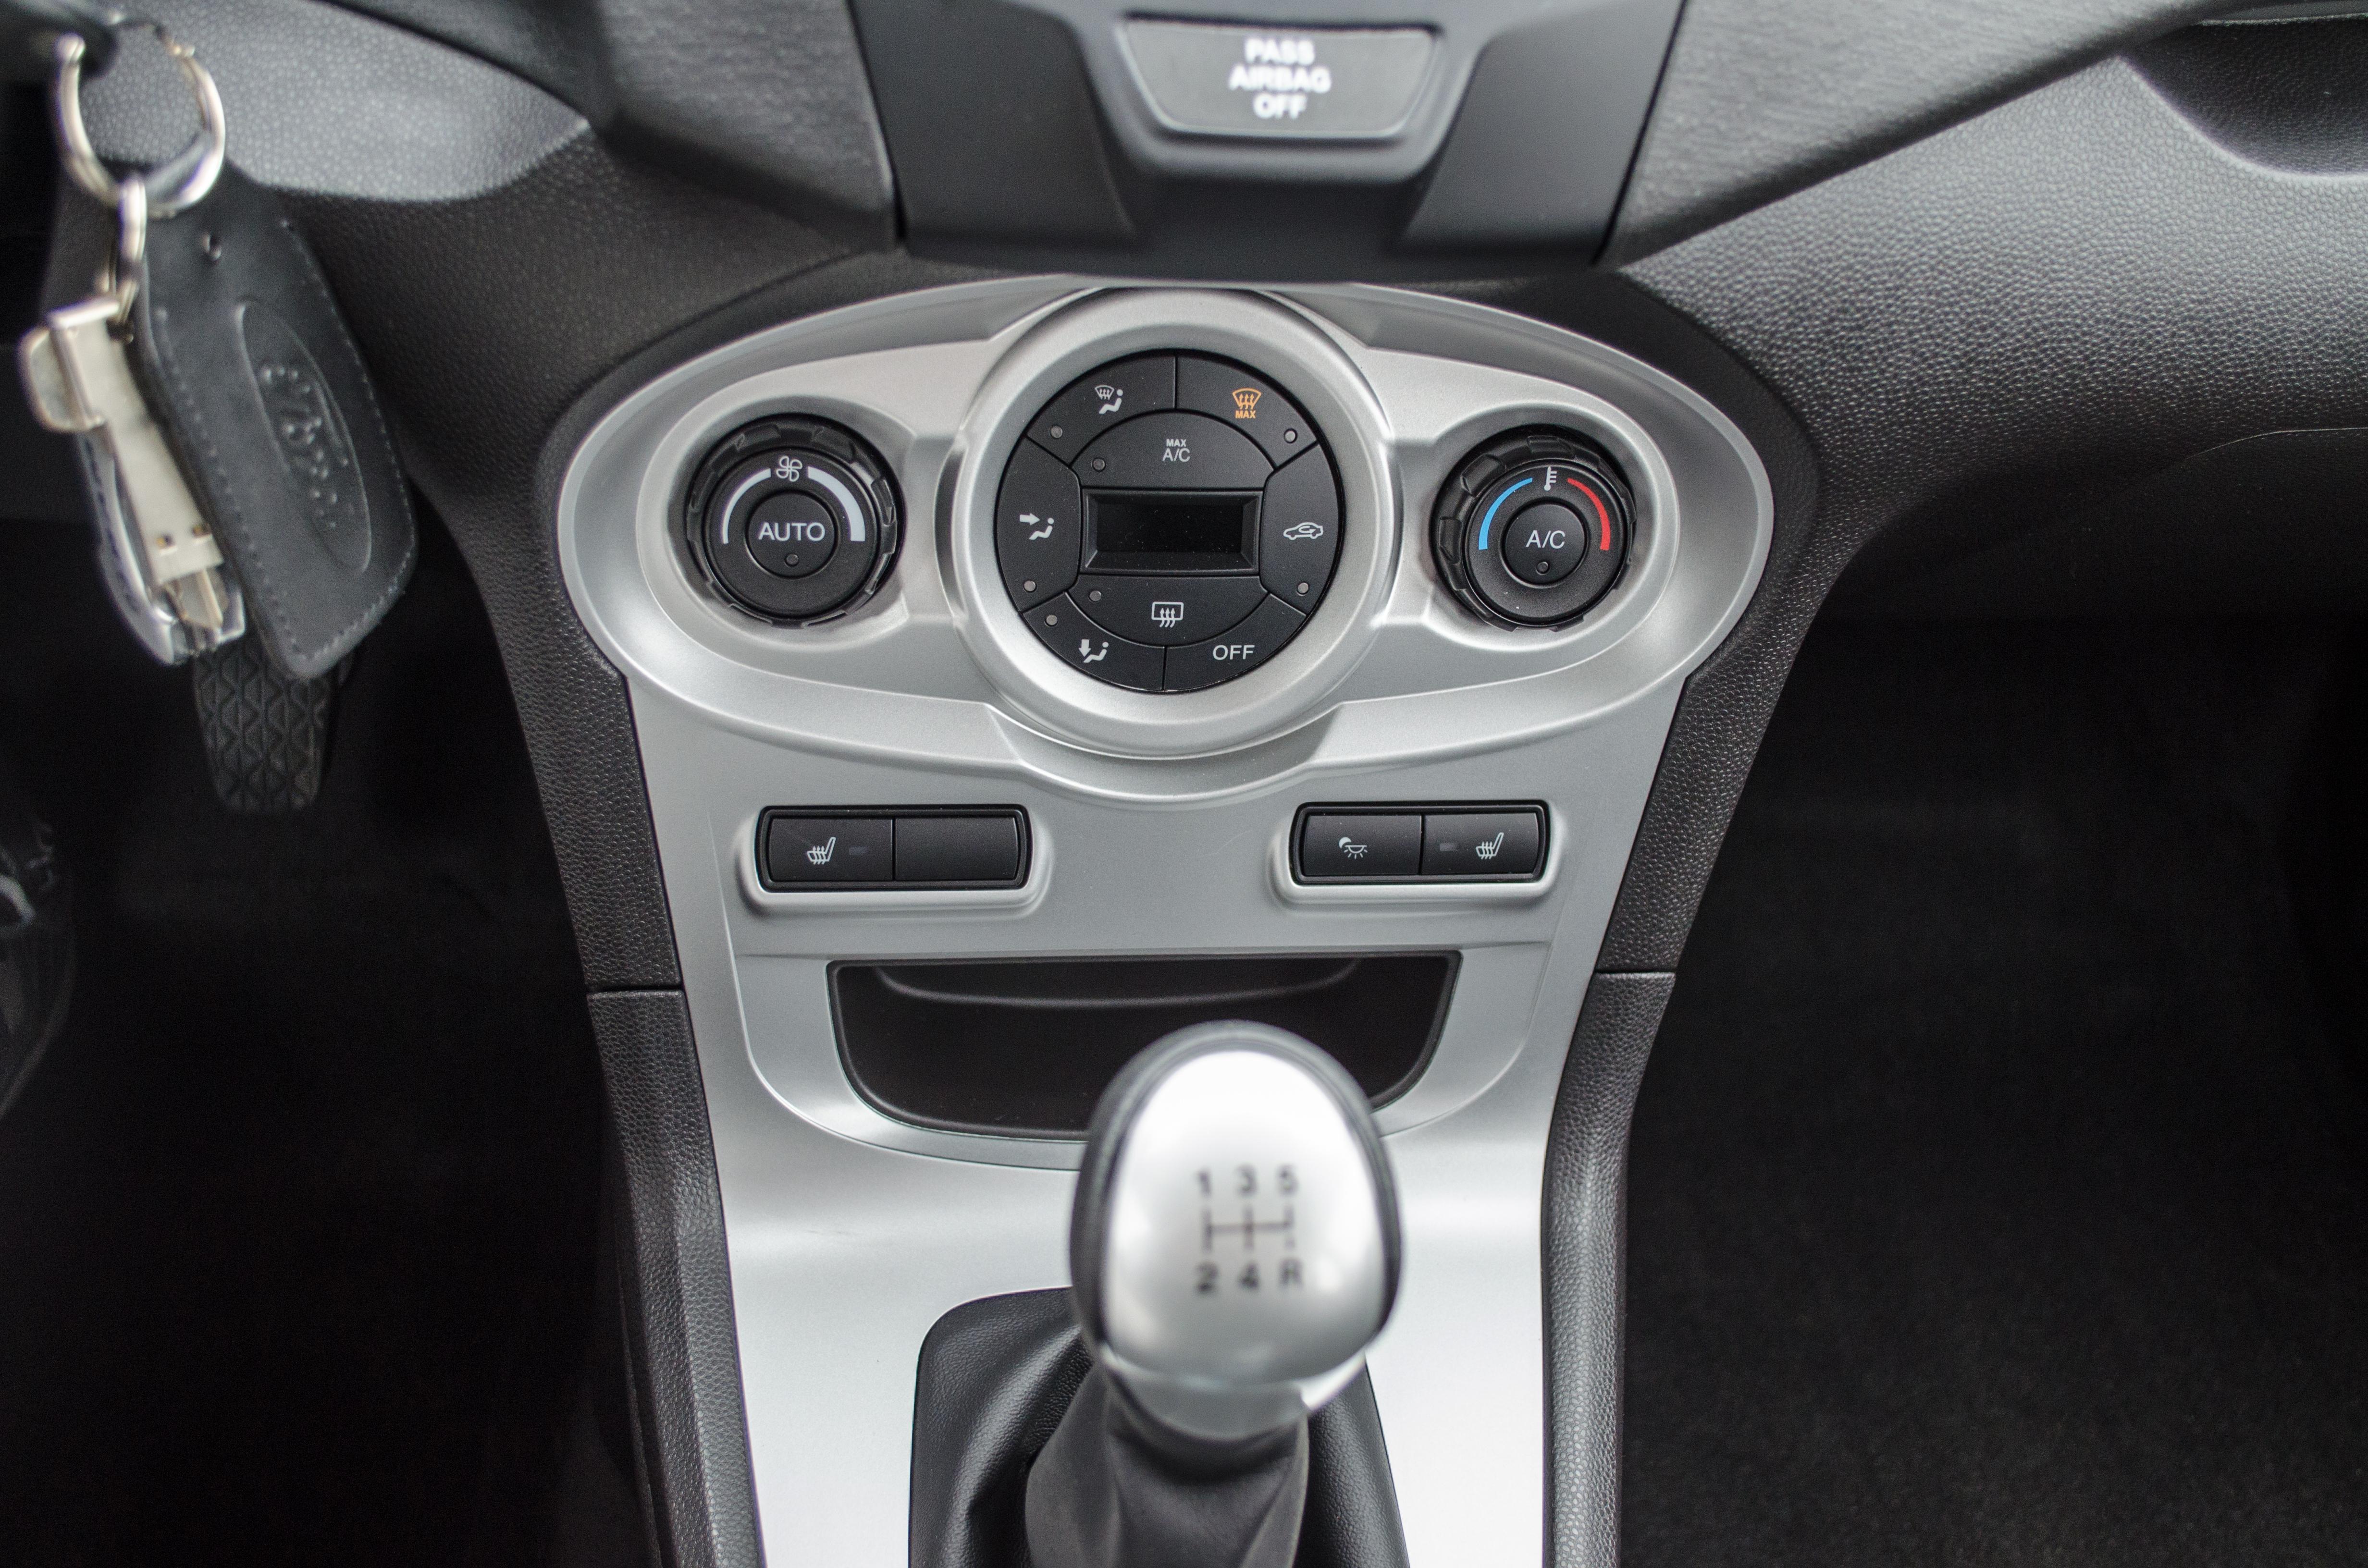 2014 Ford Fiesta SE 23 Of 28